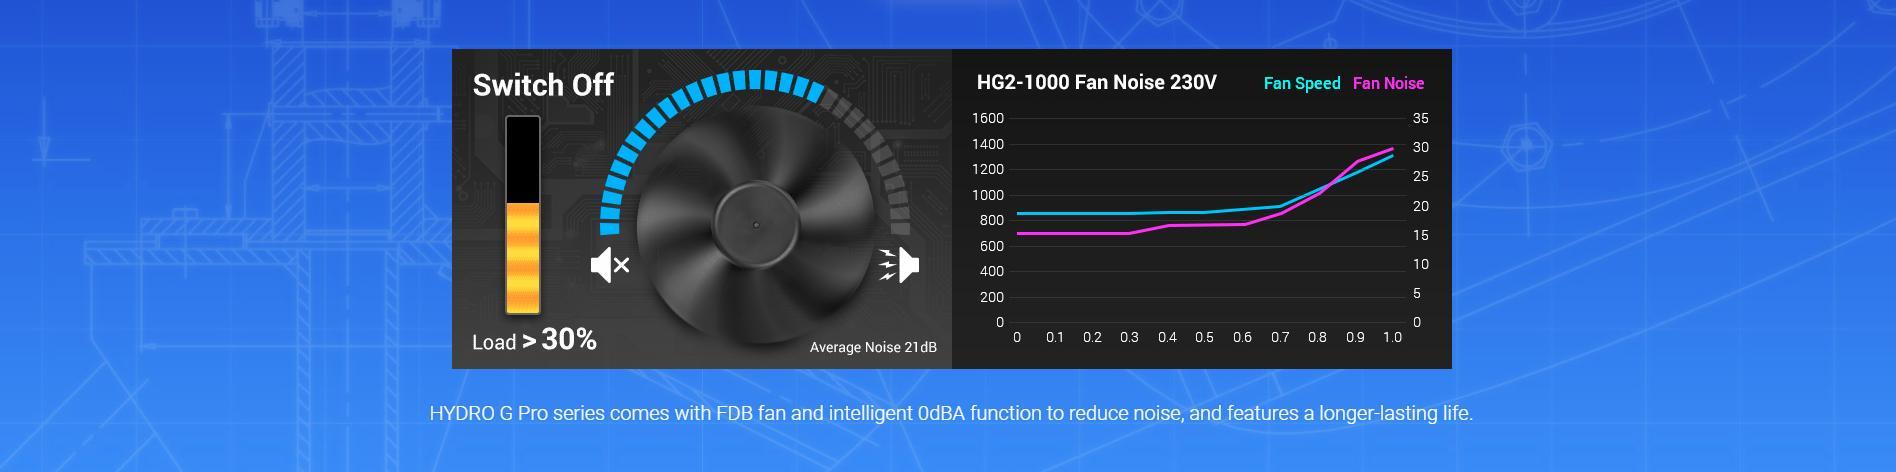 FSP Power Supply HYDRO G PRO Series Model HG2-850 - Active PFC - 80 Plus Gold - Full Modular giới thiệu 5